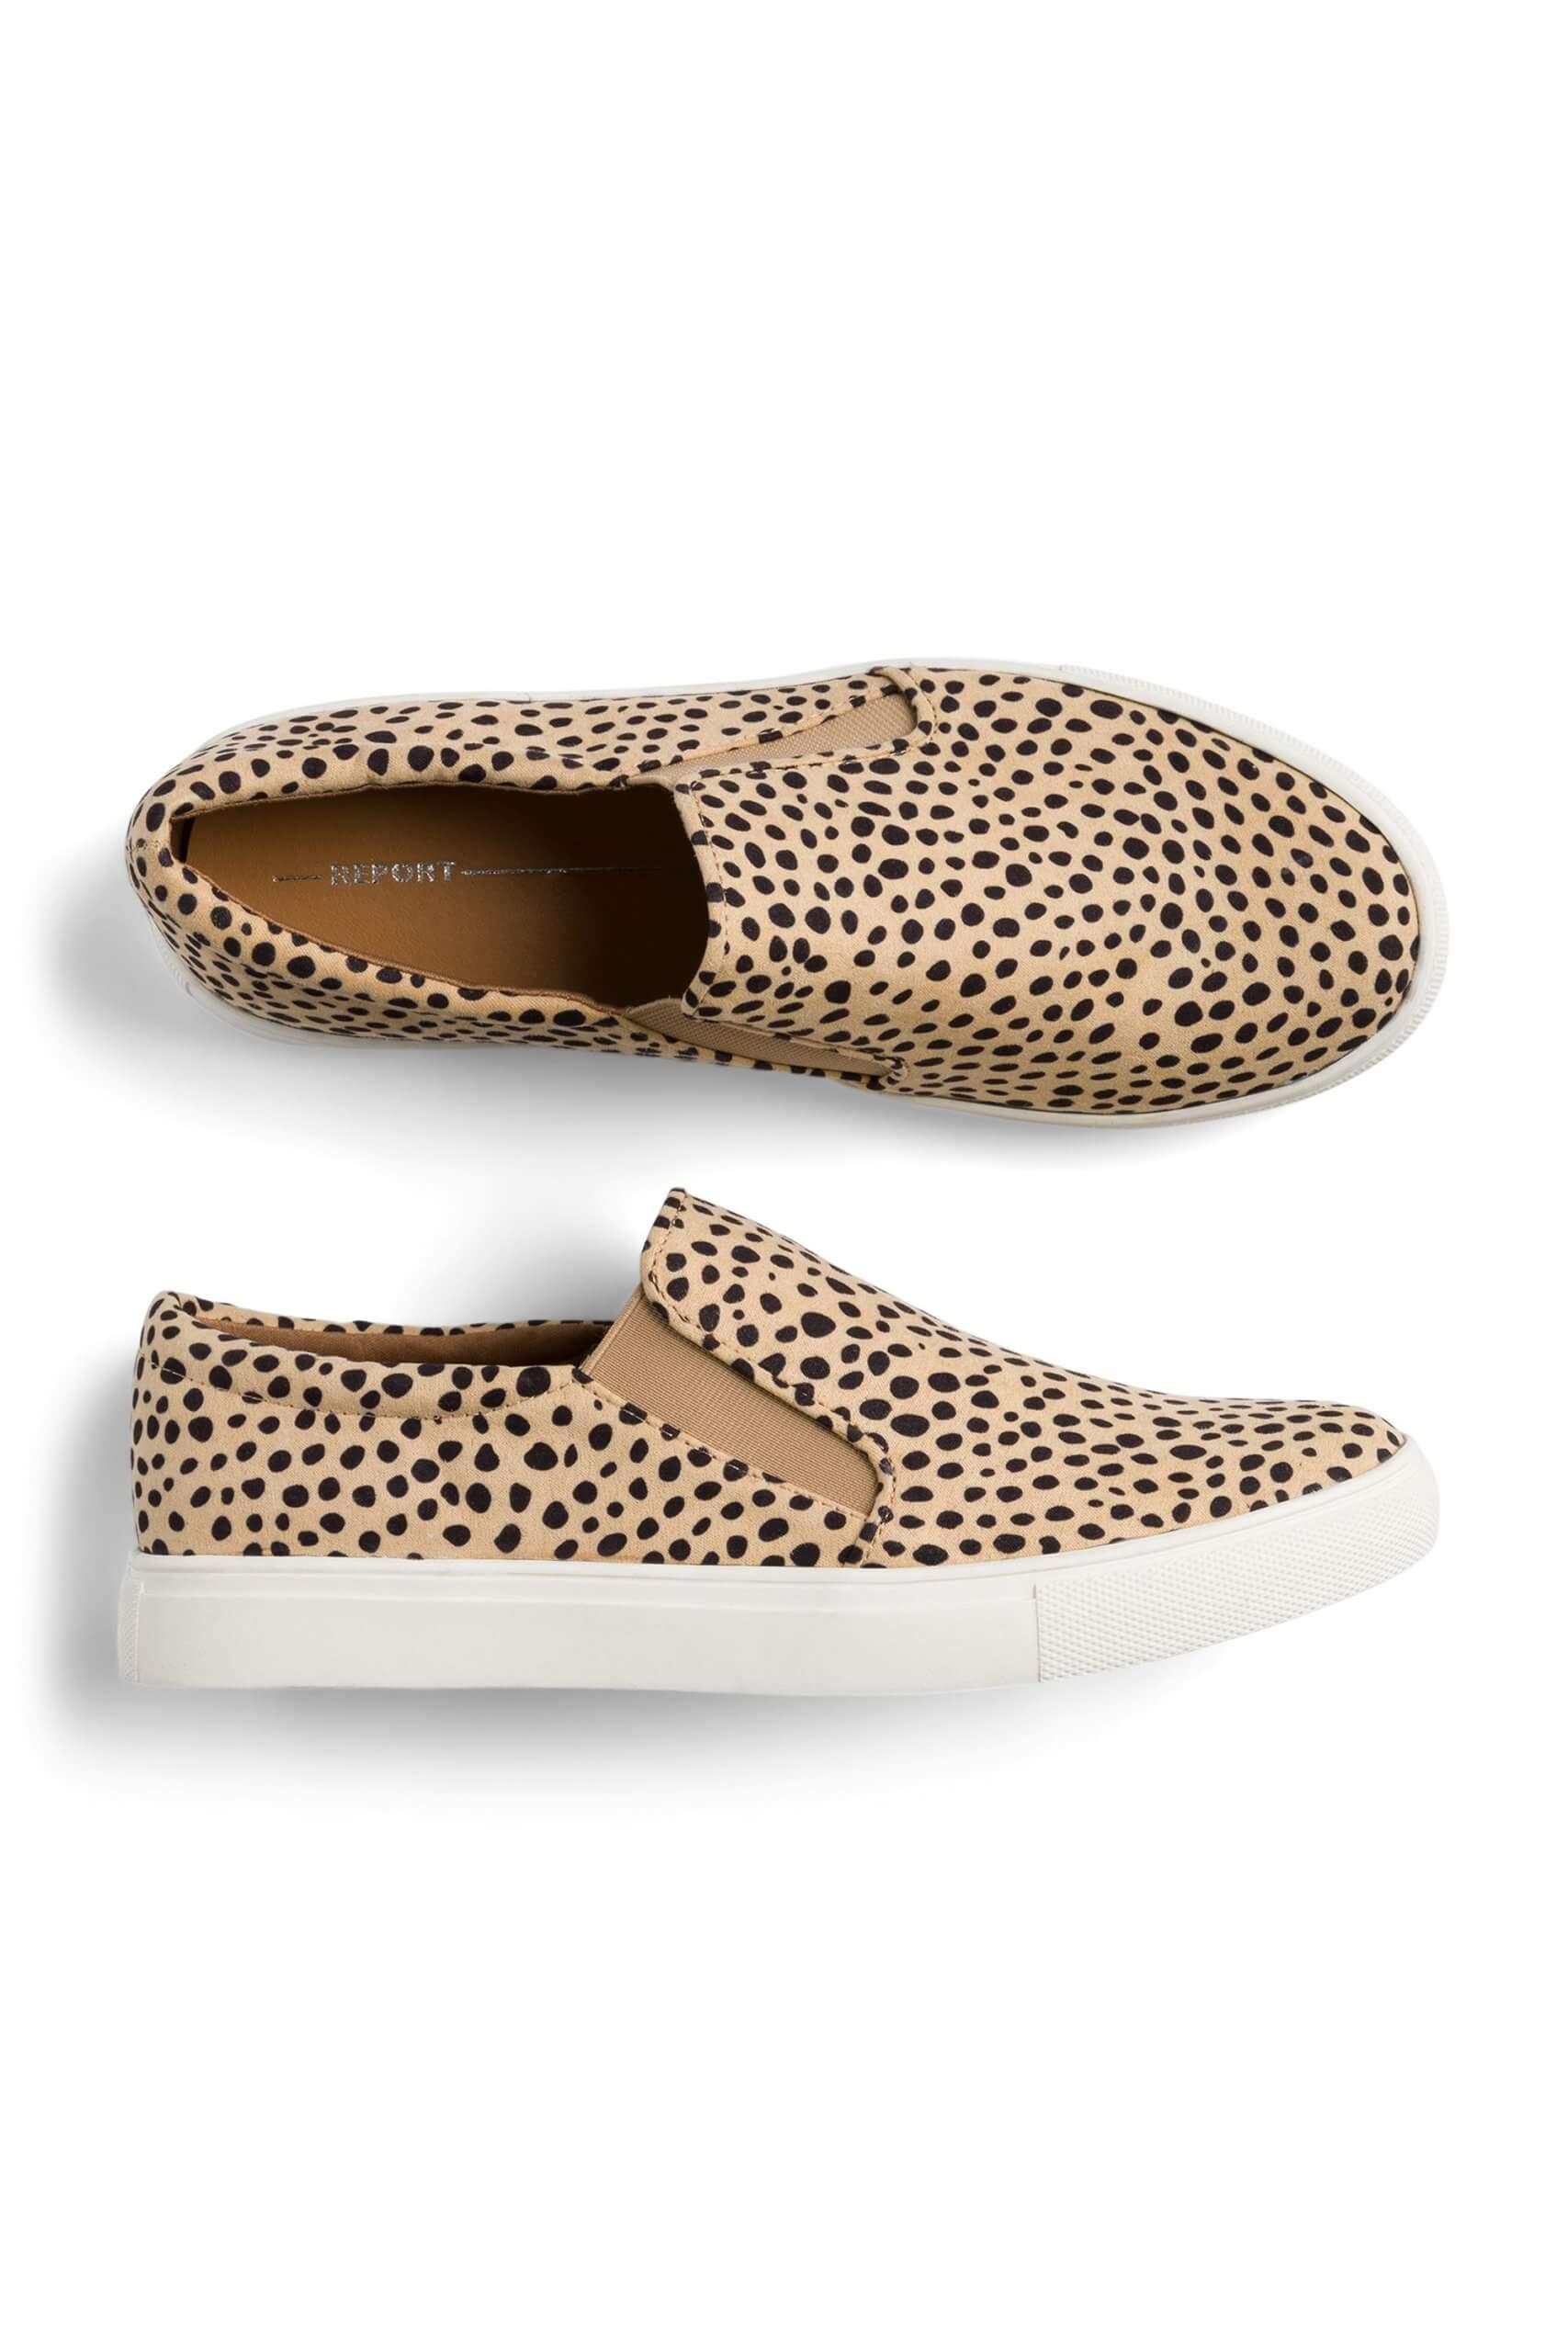 Stitch Fix Women's brown leopard print sneakers.